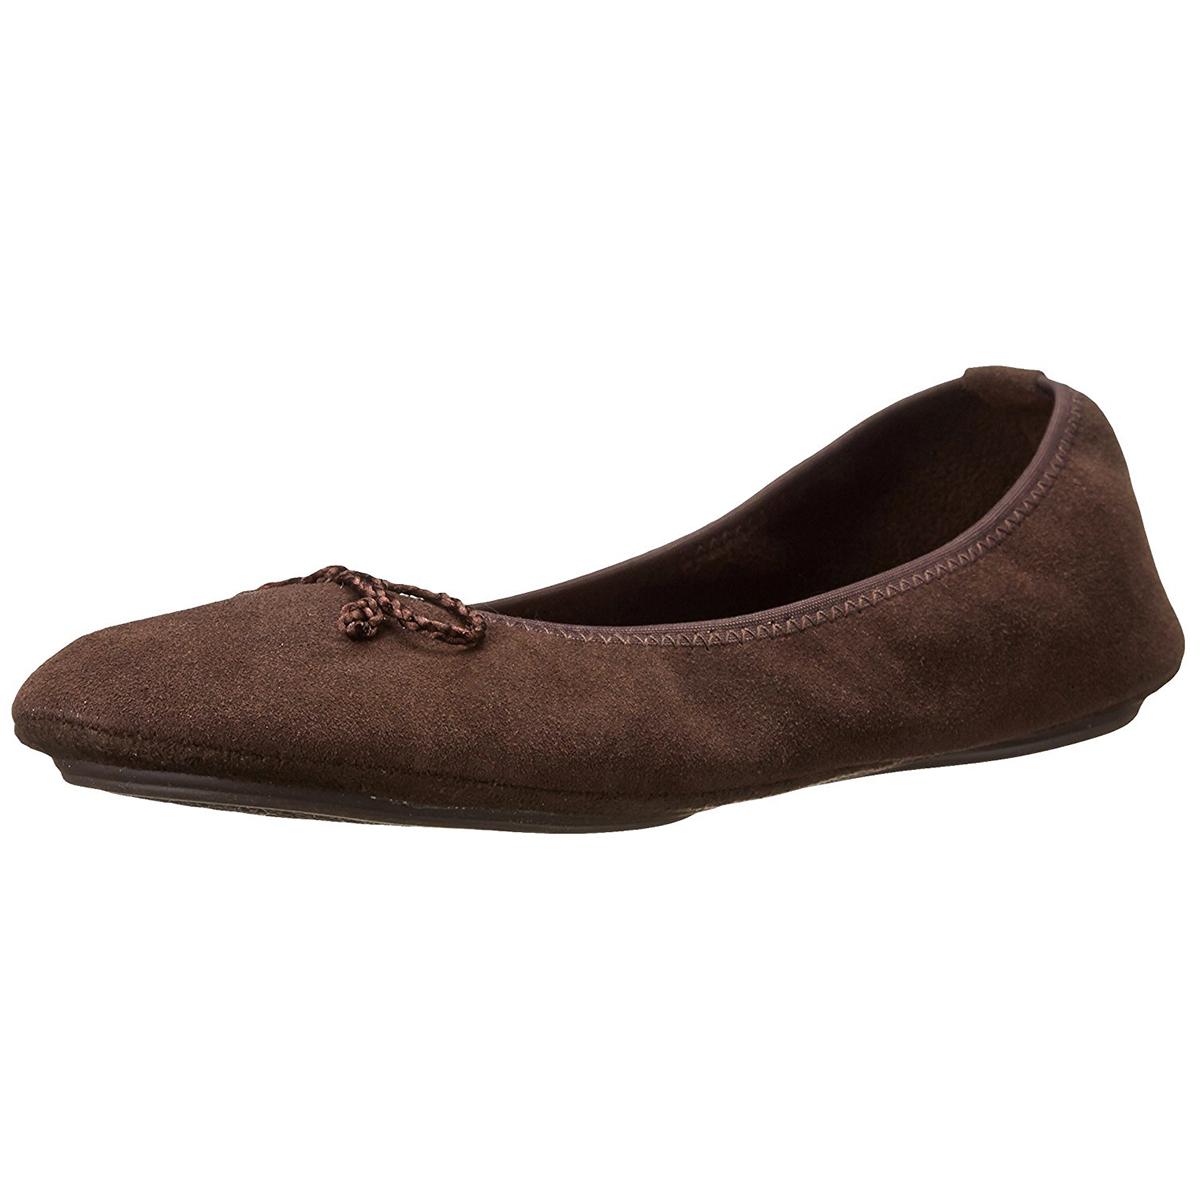 Ebay Hush Puppies Women S Shoes